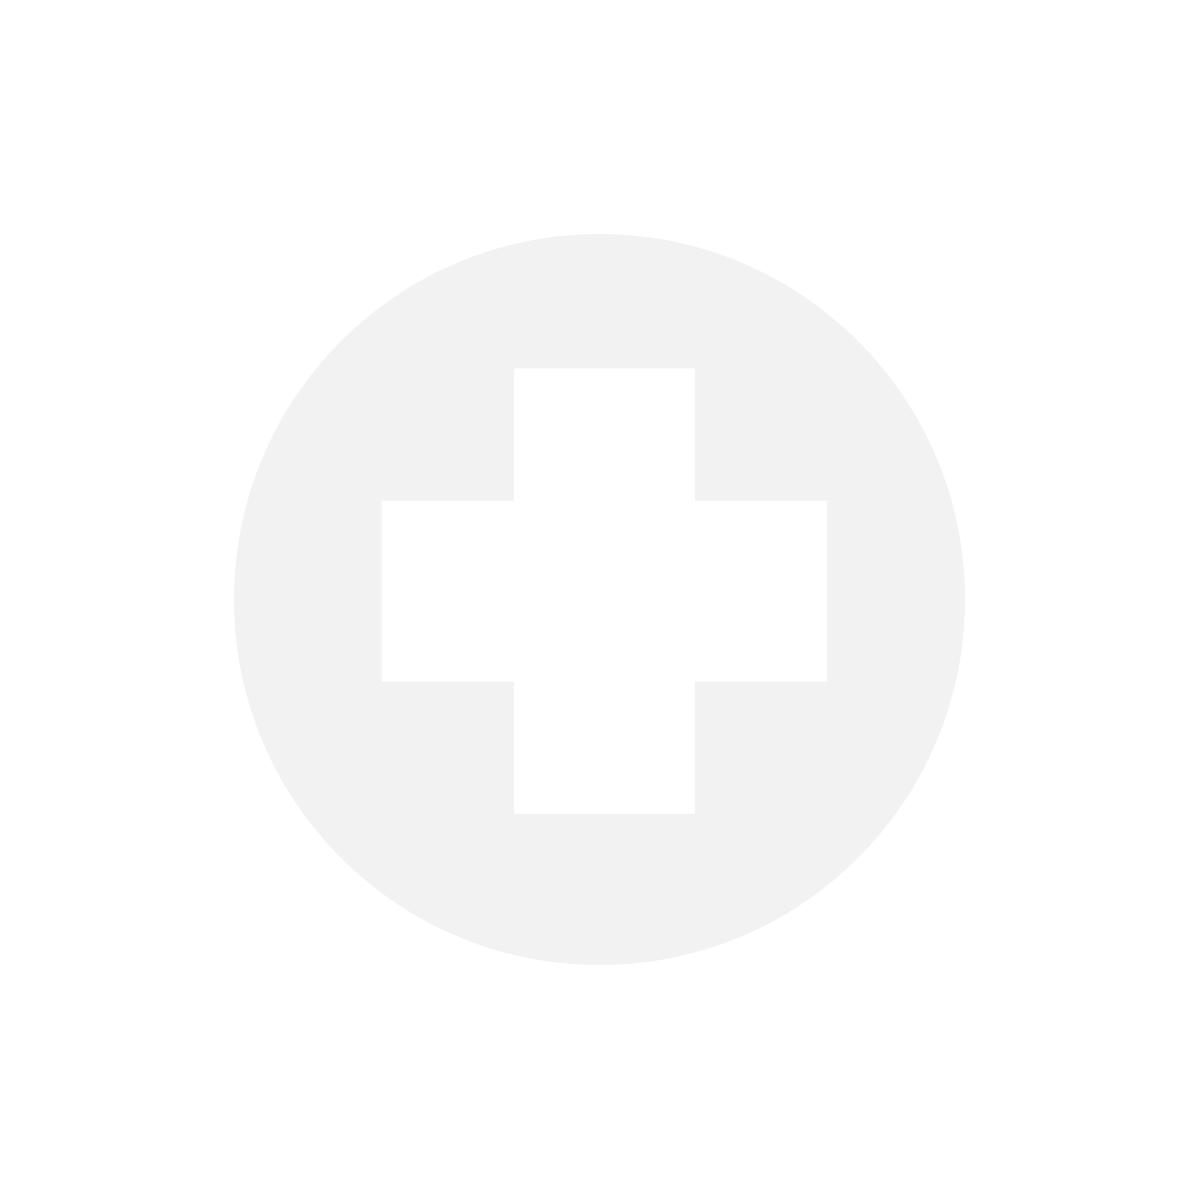 PHYSIOTHERAPIE.com Draps d'examen 50x35cm - 135 formats